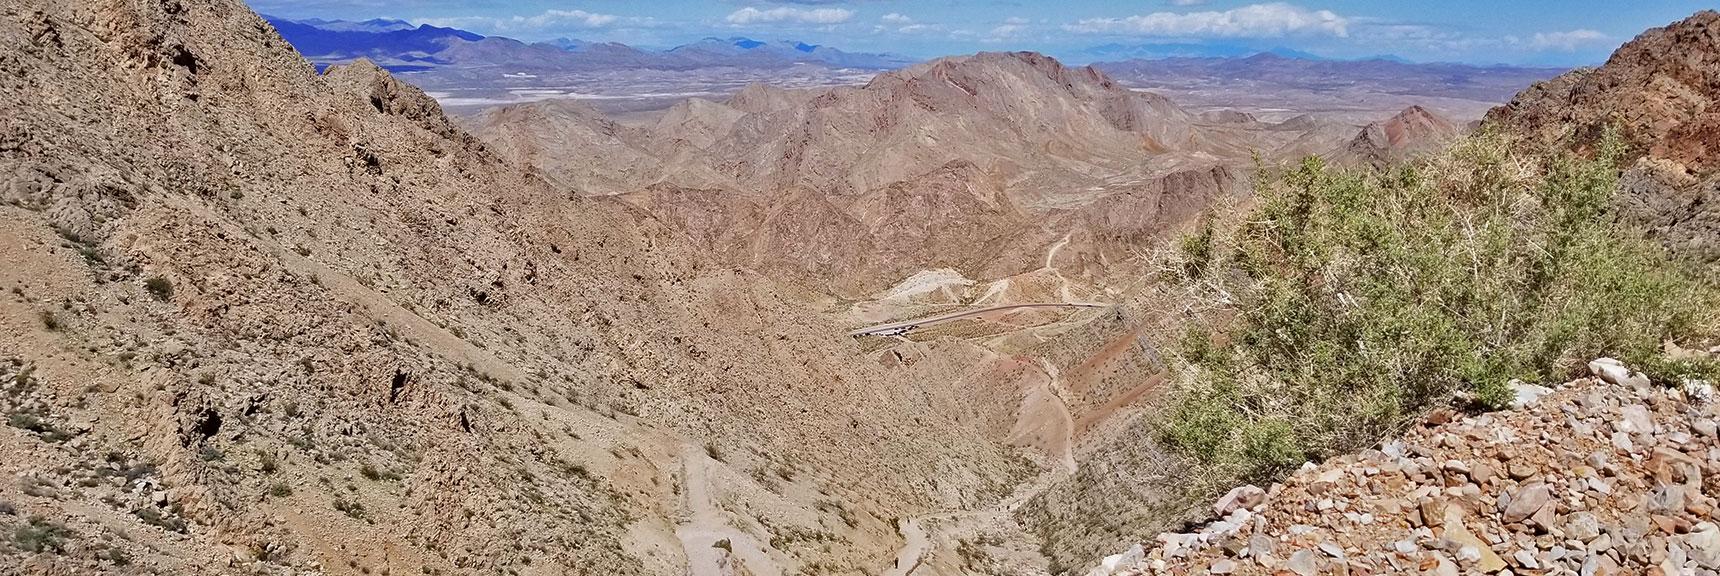 View Back Down Toward Trailhead for Frenchman Mountain, Nevada